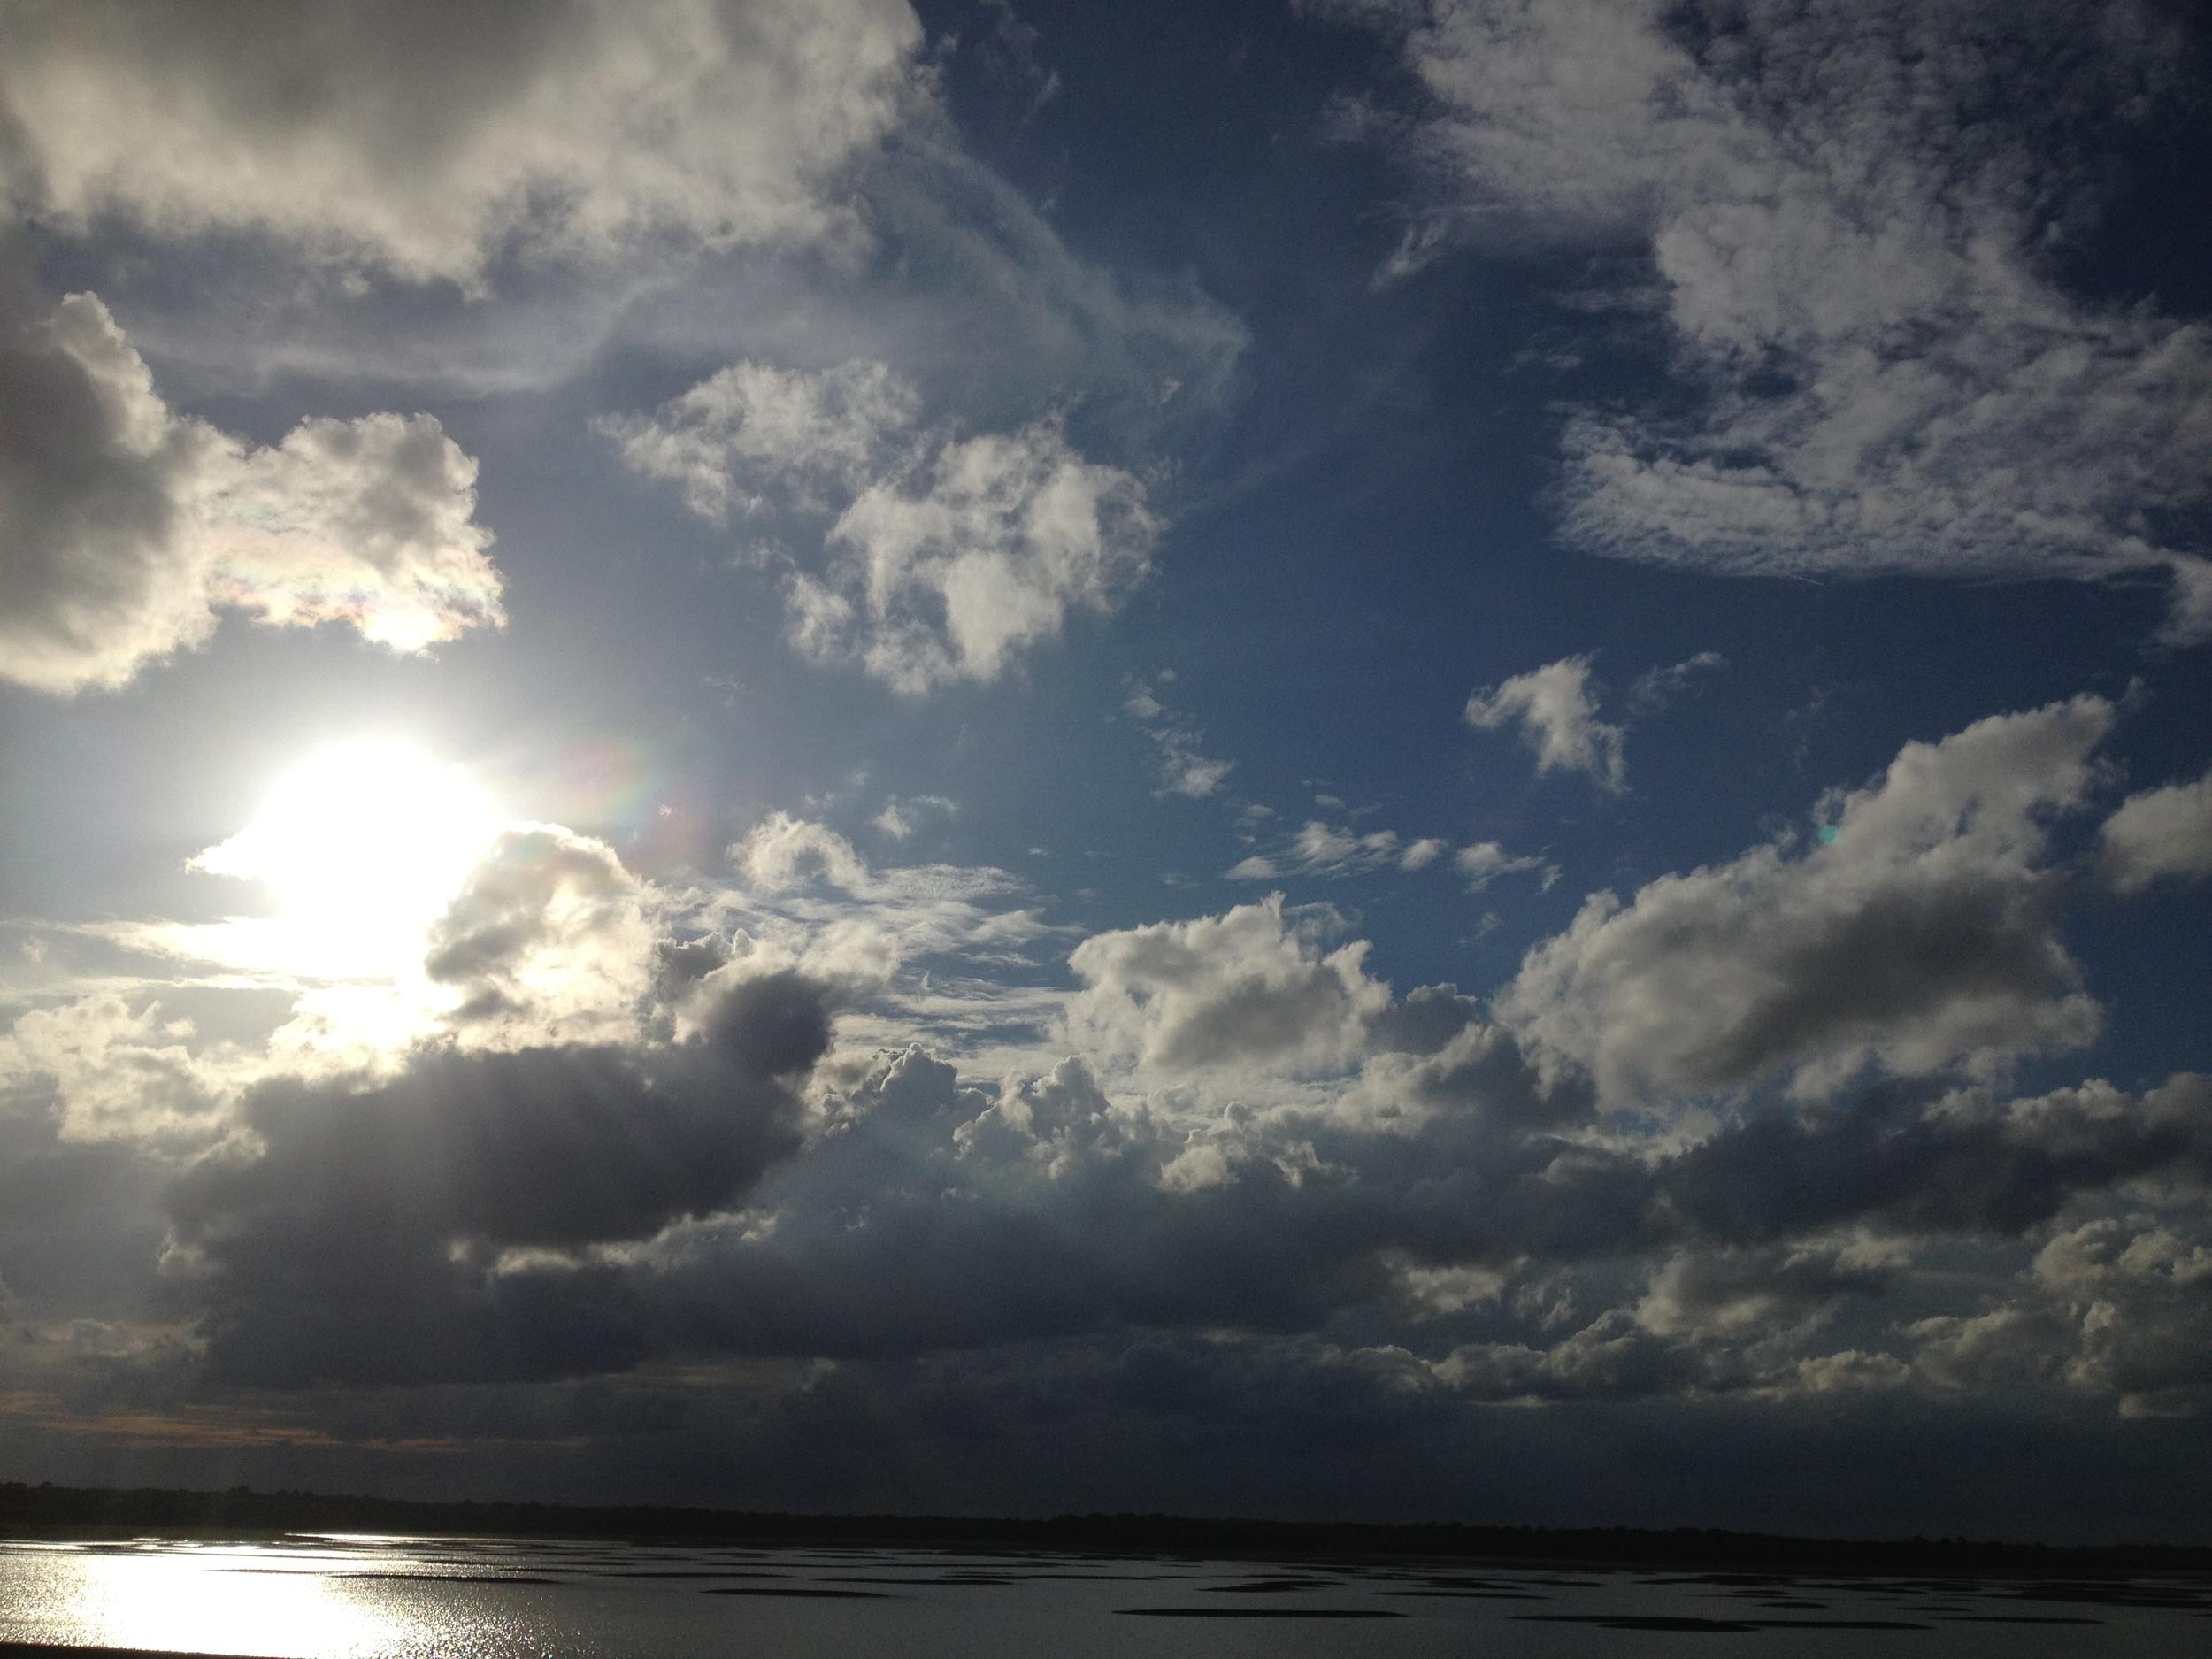 Intracoastal at low tide, October 2 2012